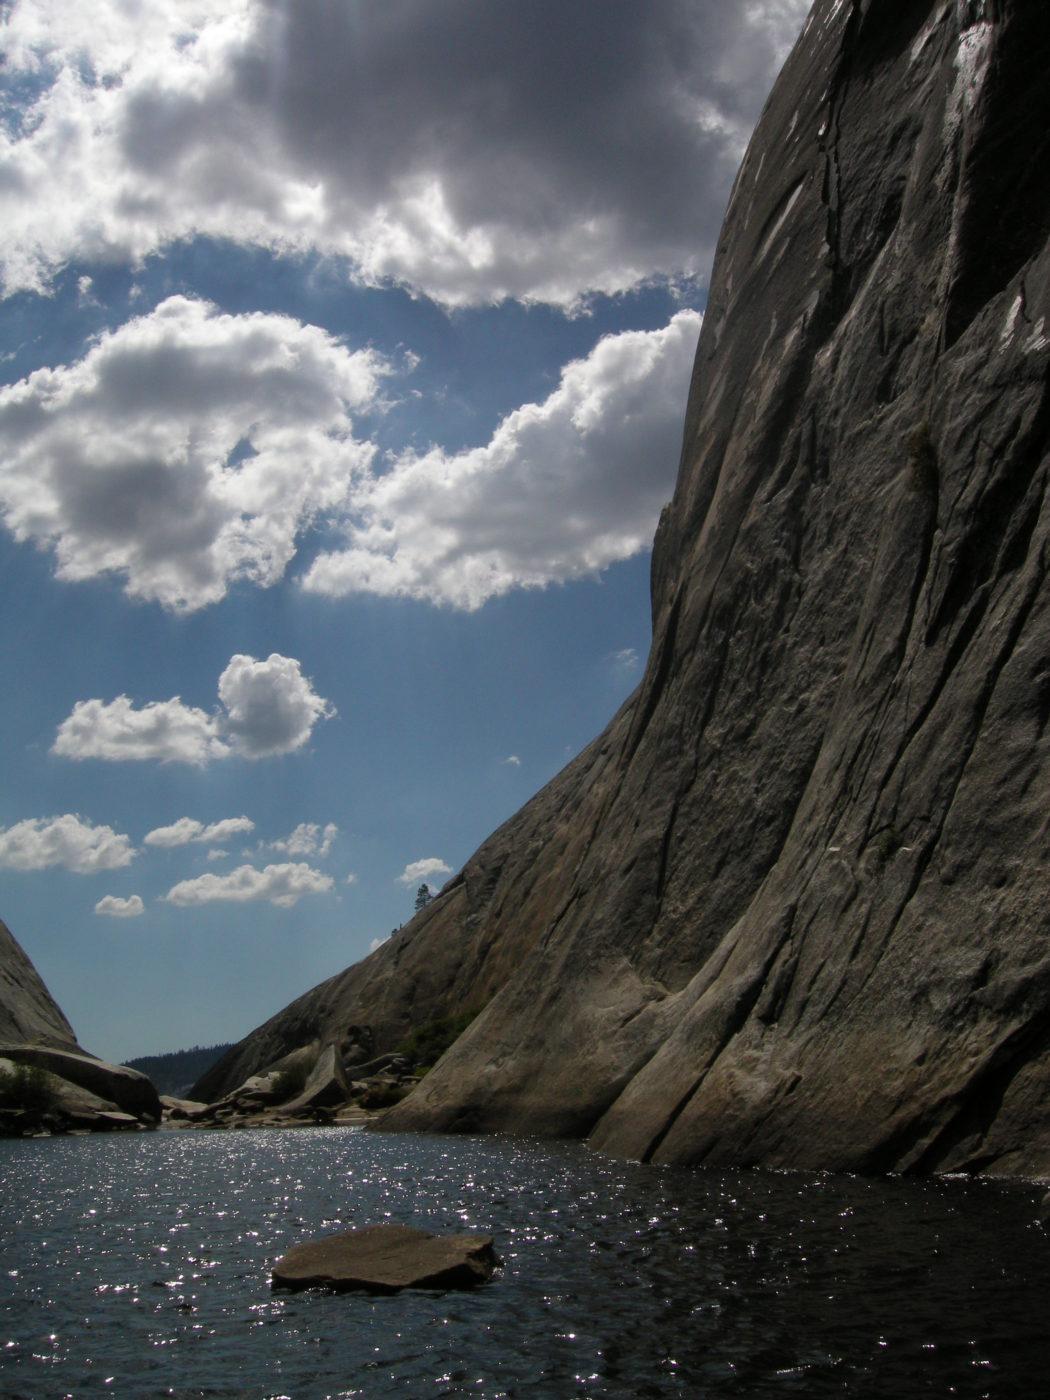 Fiume Granito Trekking Yosemite California